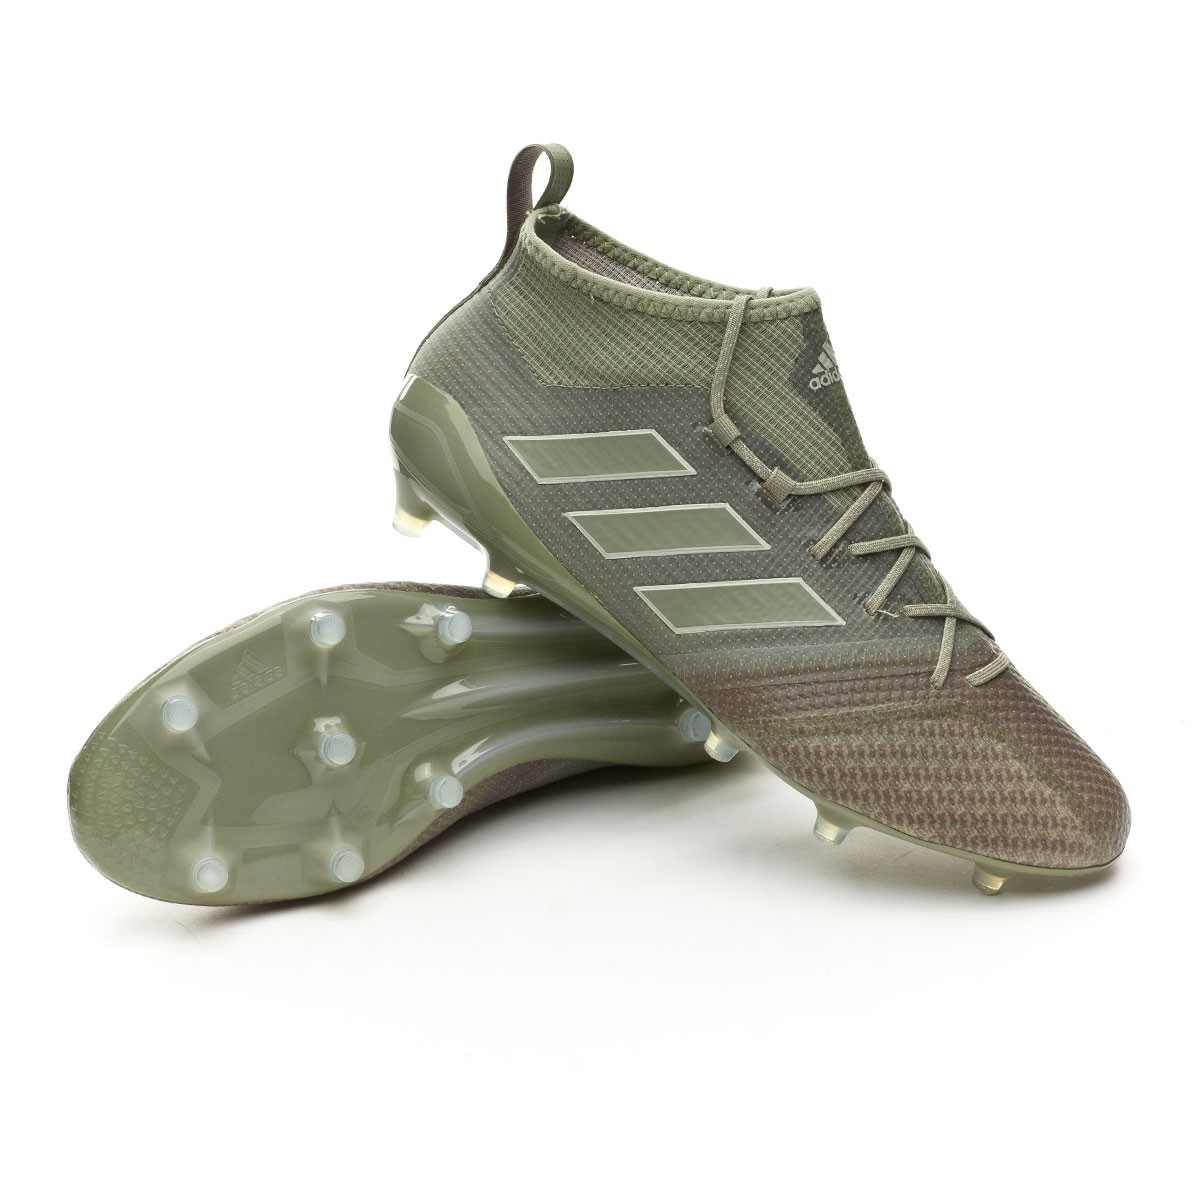 8127a44ebcd Football Boots adidas Ace 17.1 Primeknit FG Clay-Sesame - Tienda de ...